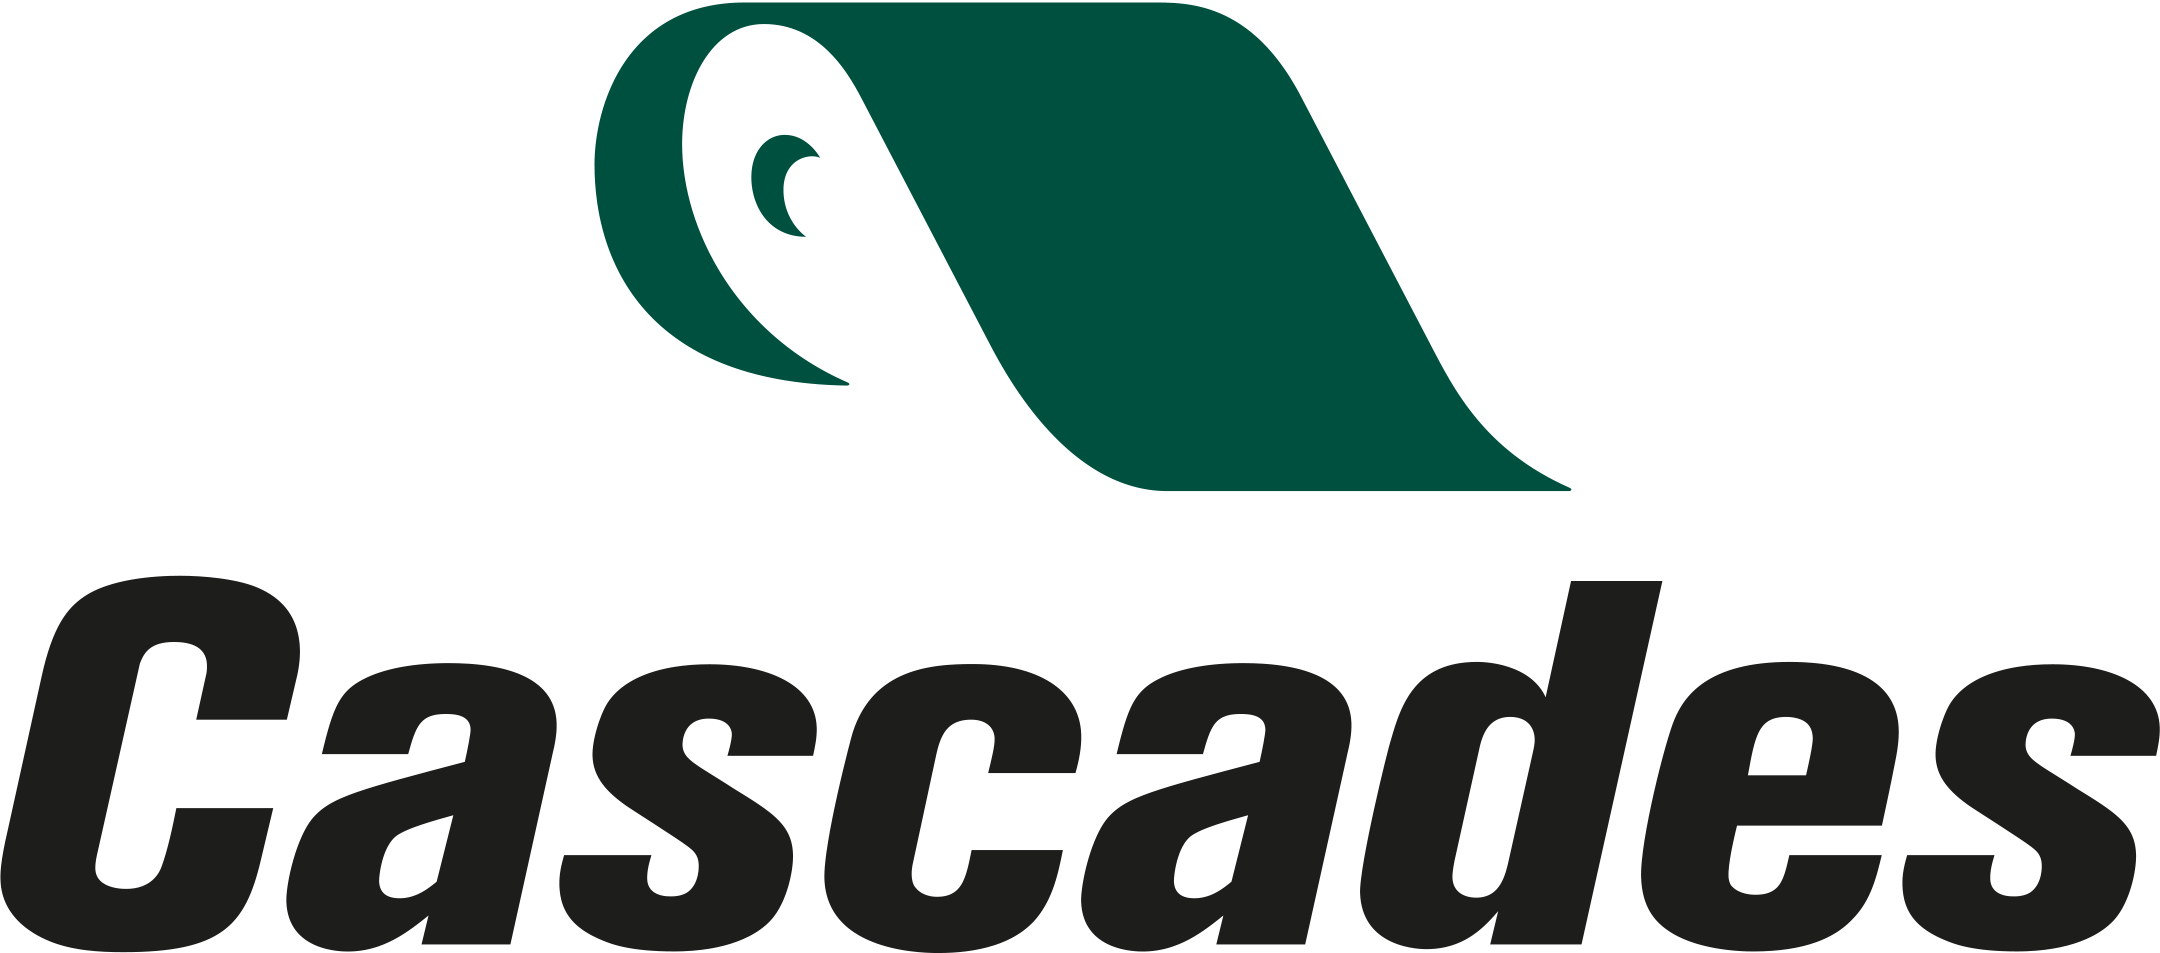 Cascades_grand (002).png